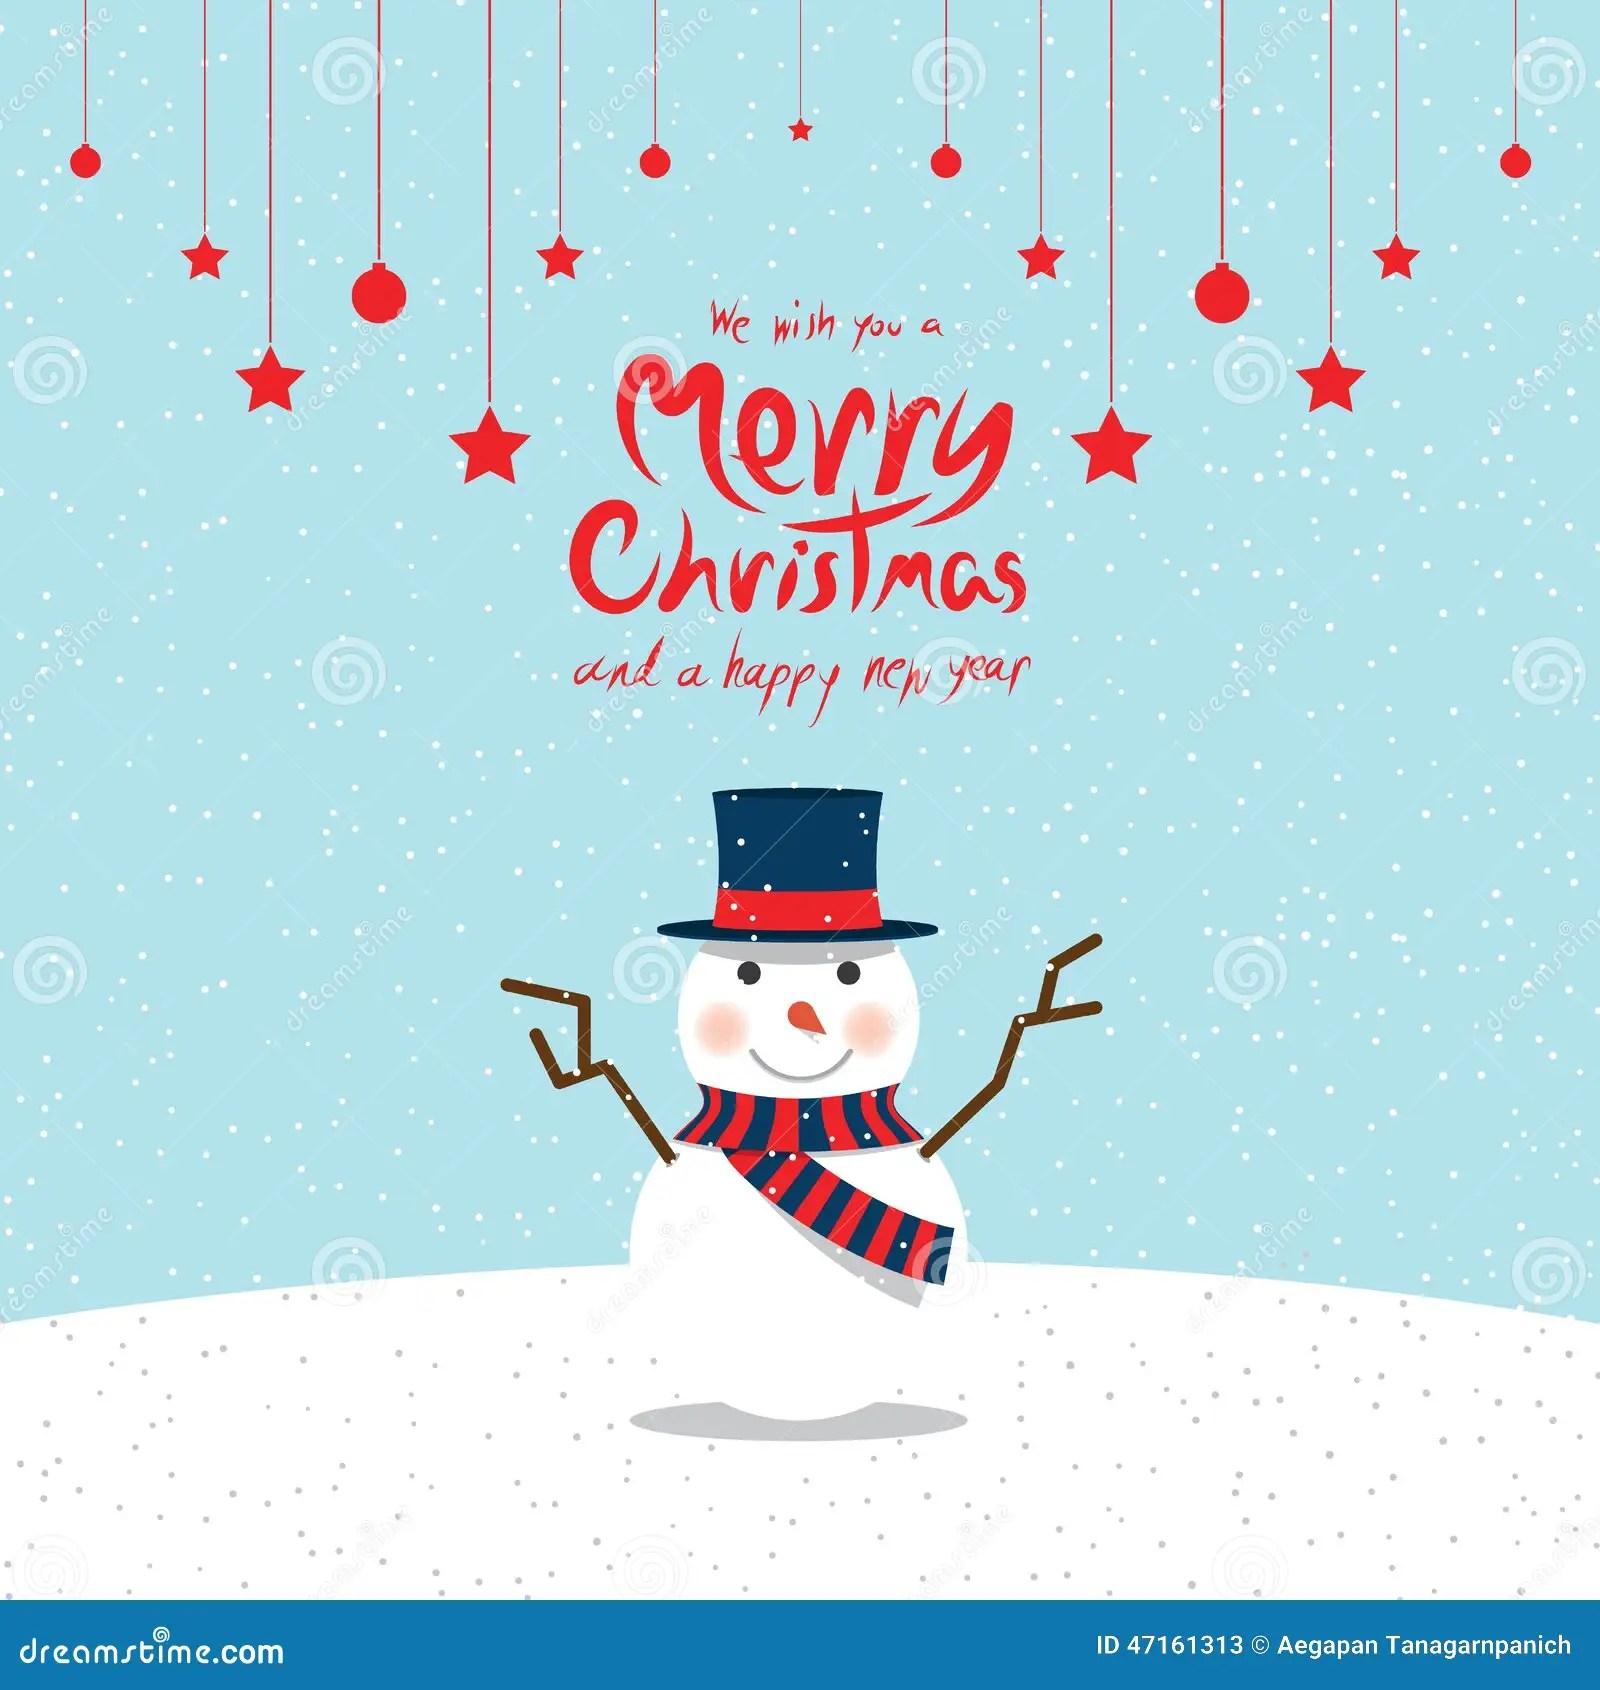 Snowman Christmas Cards Stock Vector Image 47161313